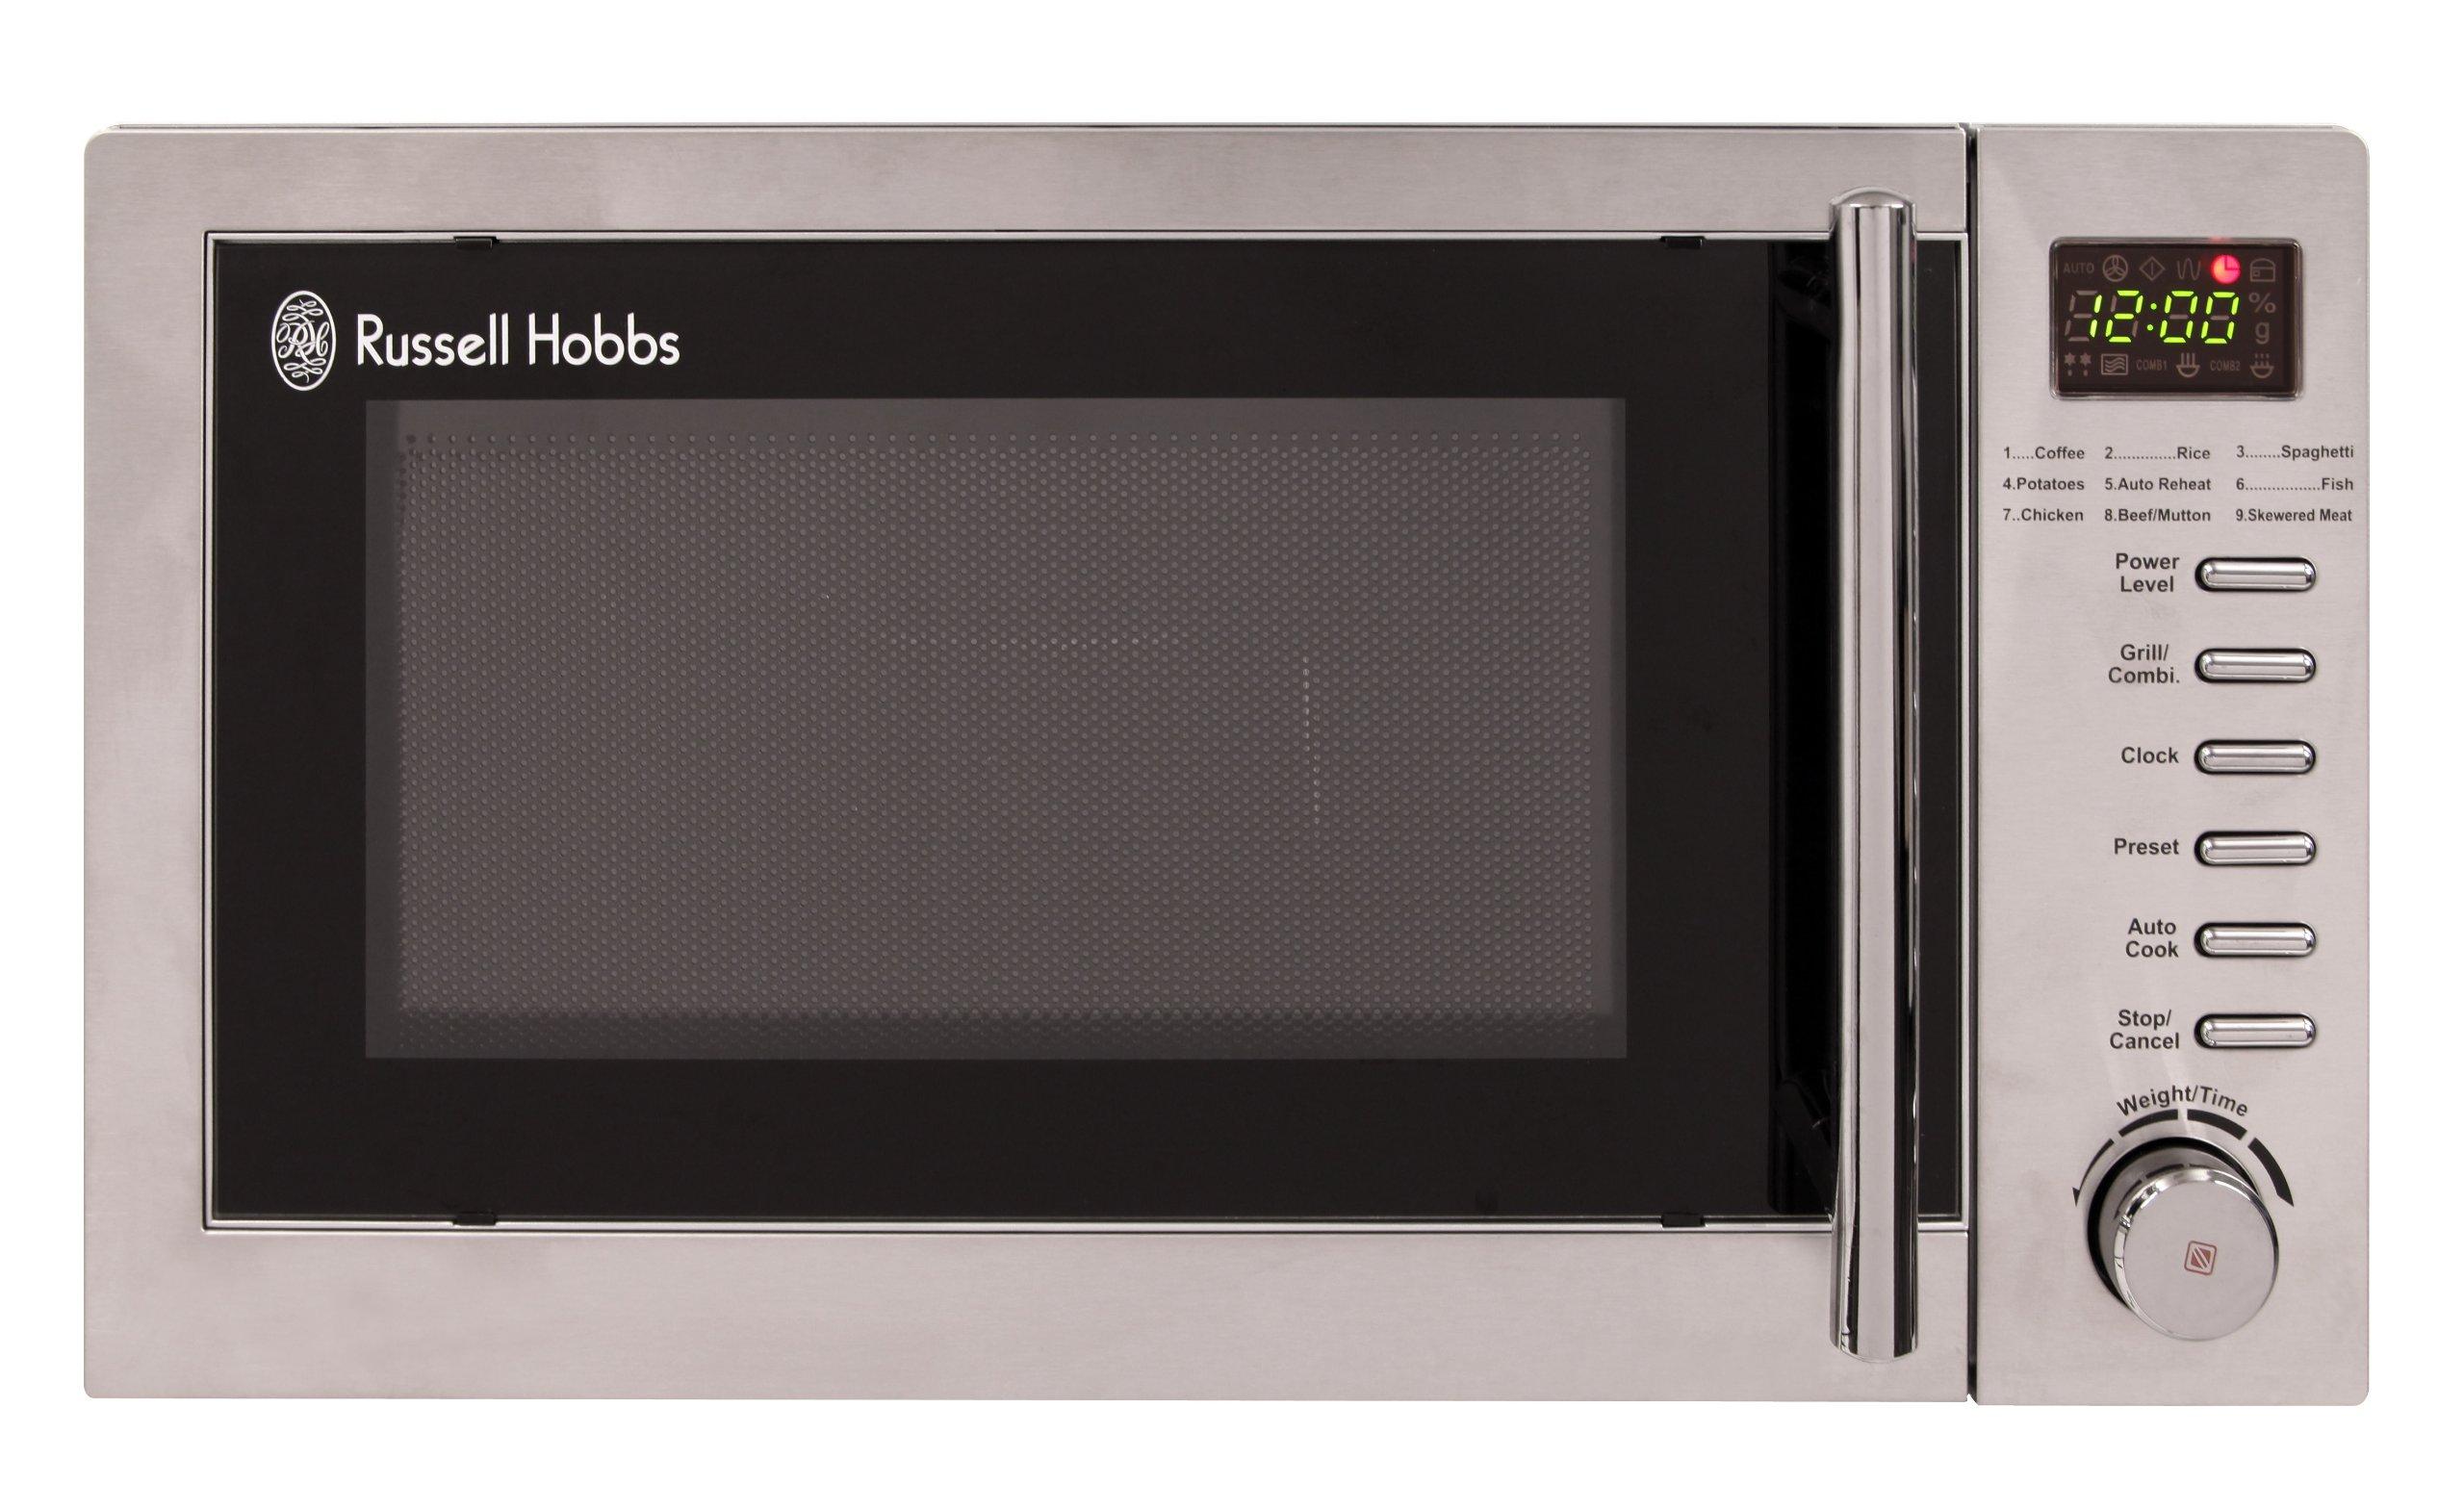 russell hobbs rhm2031 20 litre stainless steel digital. Black Bedroom Furniture Sets. Home Design Ideas